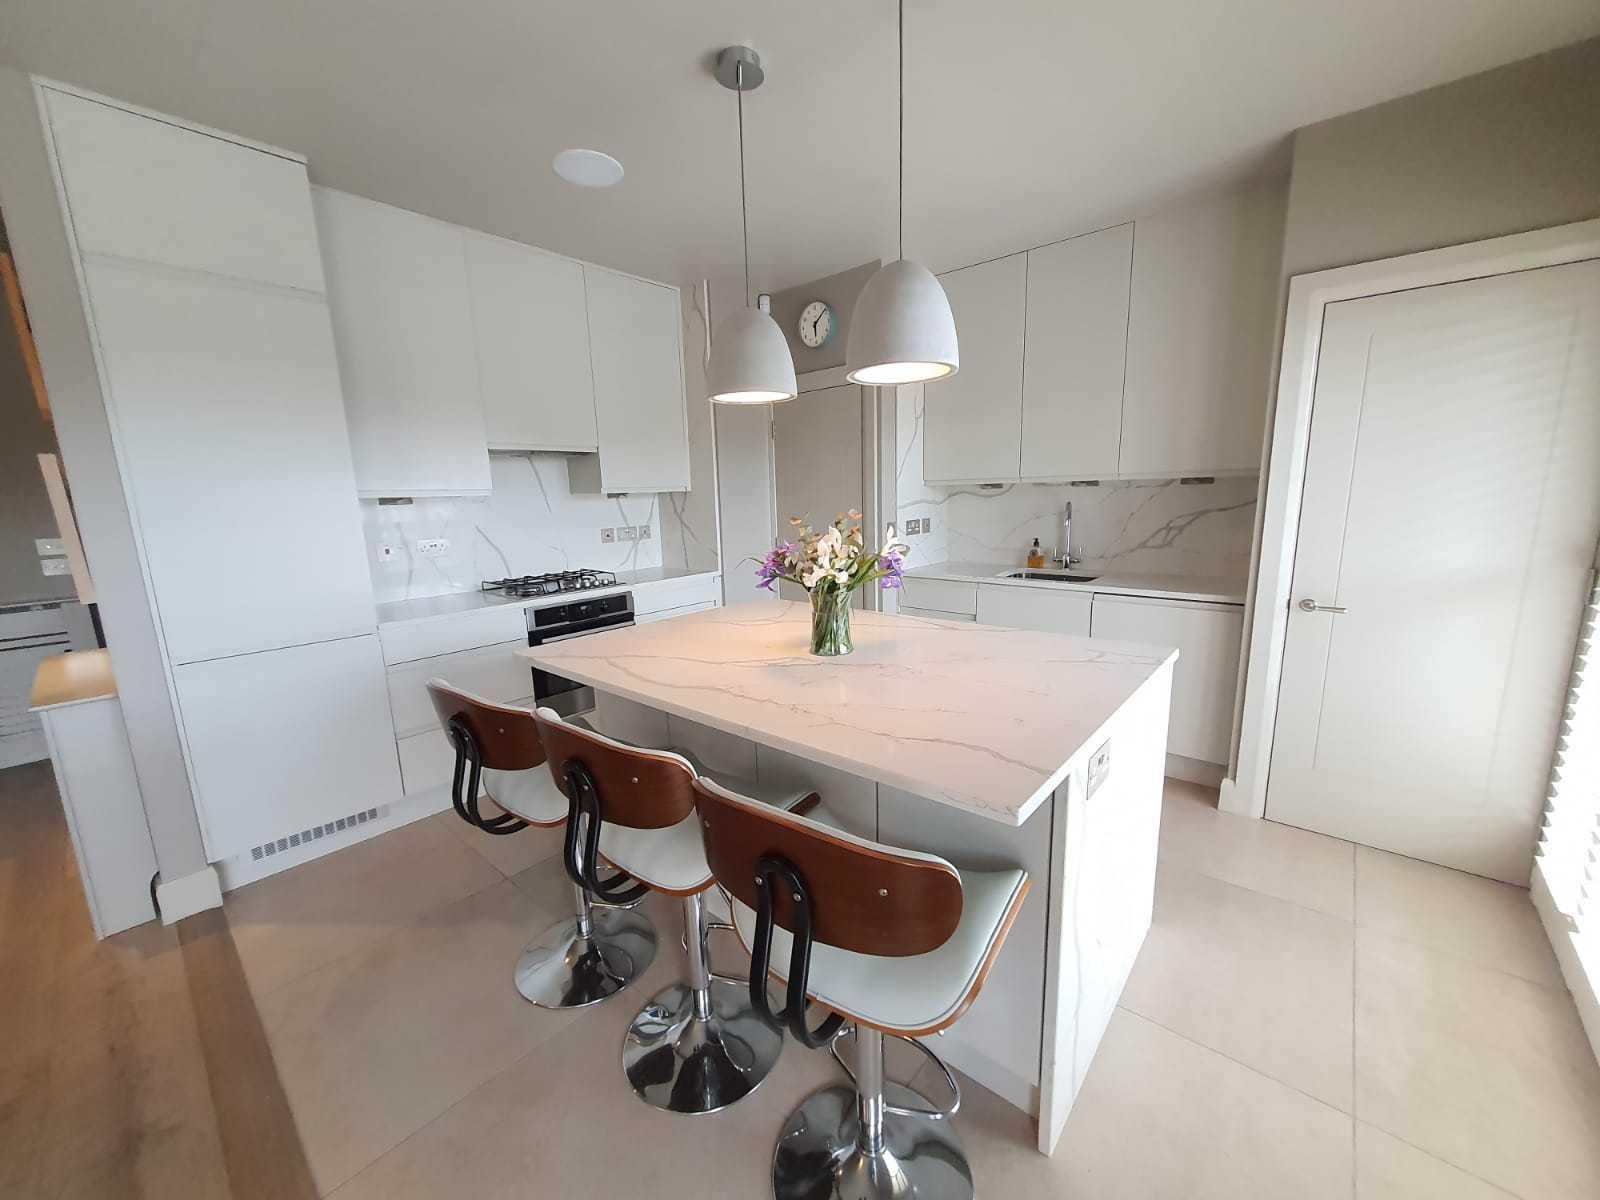 Apartment 55, Shrewsbury, Donnybrook Castle, Donnybrook, Dublin 4